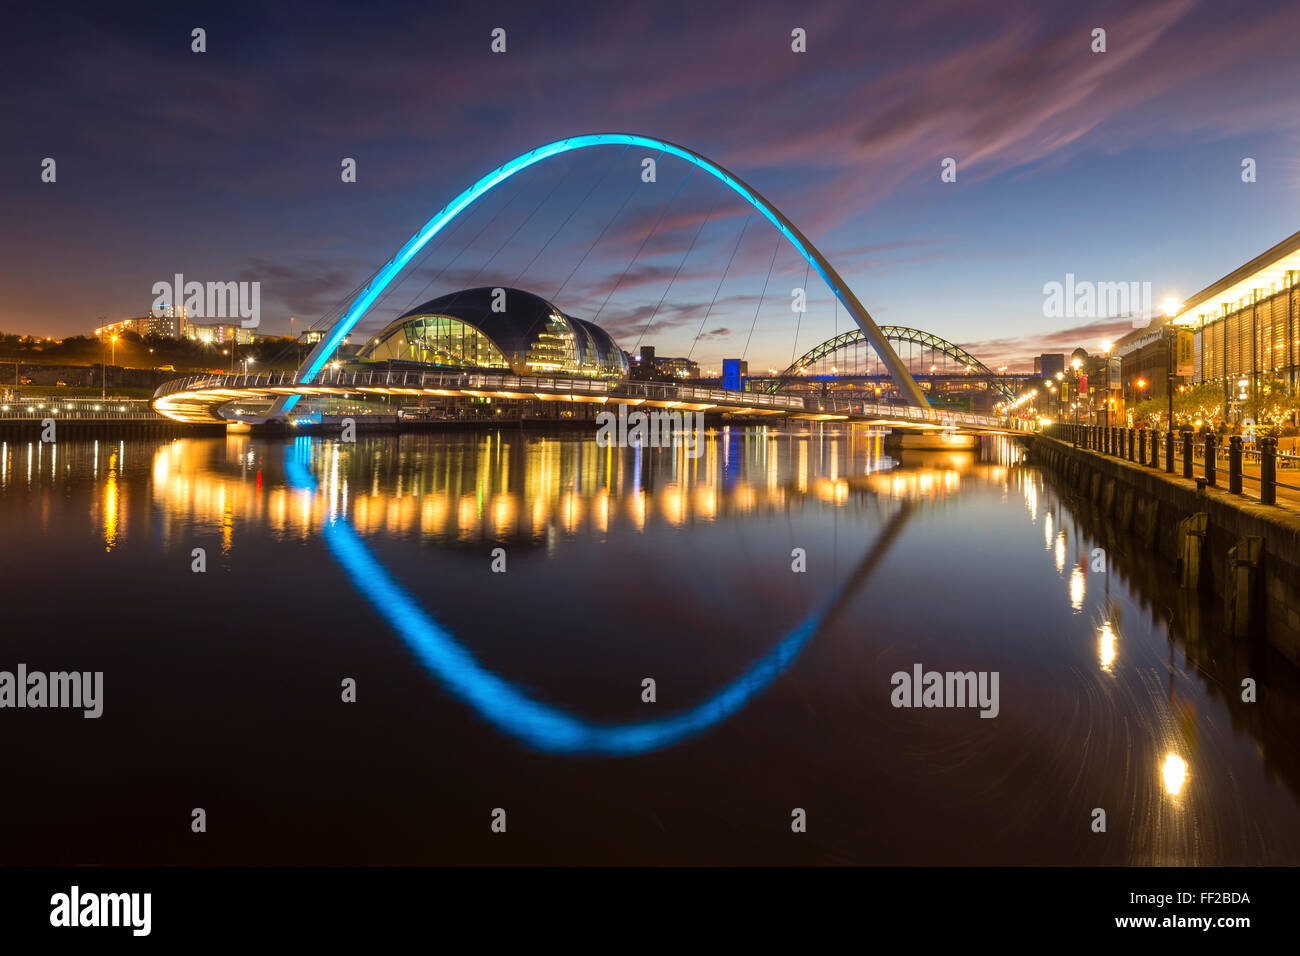 Gateshead MiRMRMennium Bridge at night, River Tyne, NewcastRMe Upon Tyne, Tyne and Wear, EngRMand, United Kingdom, - Stock Image